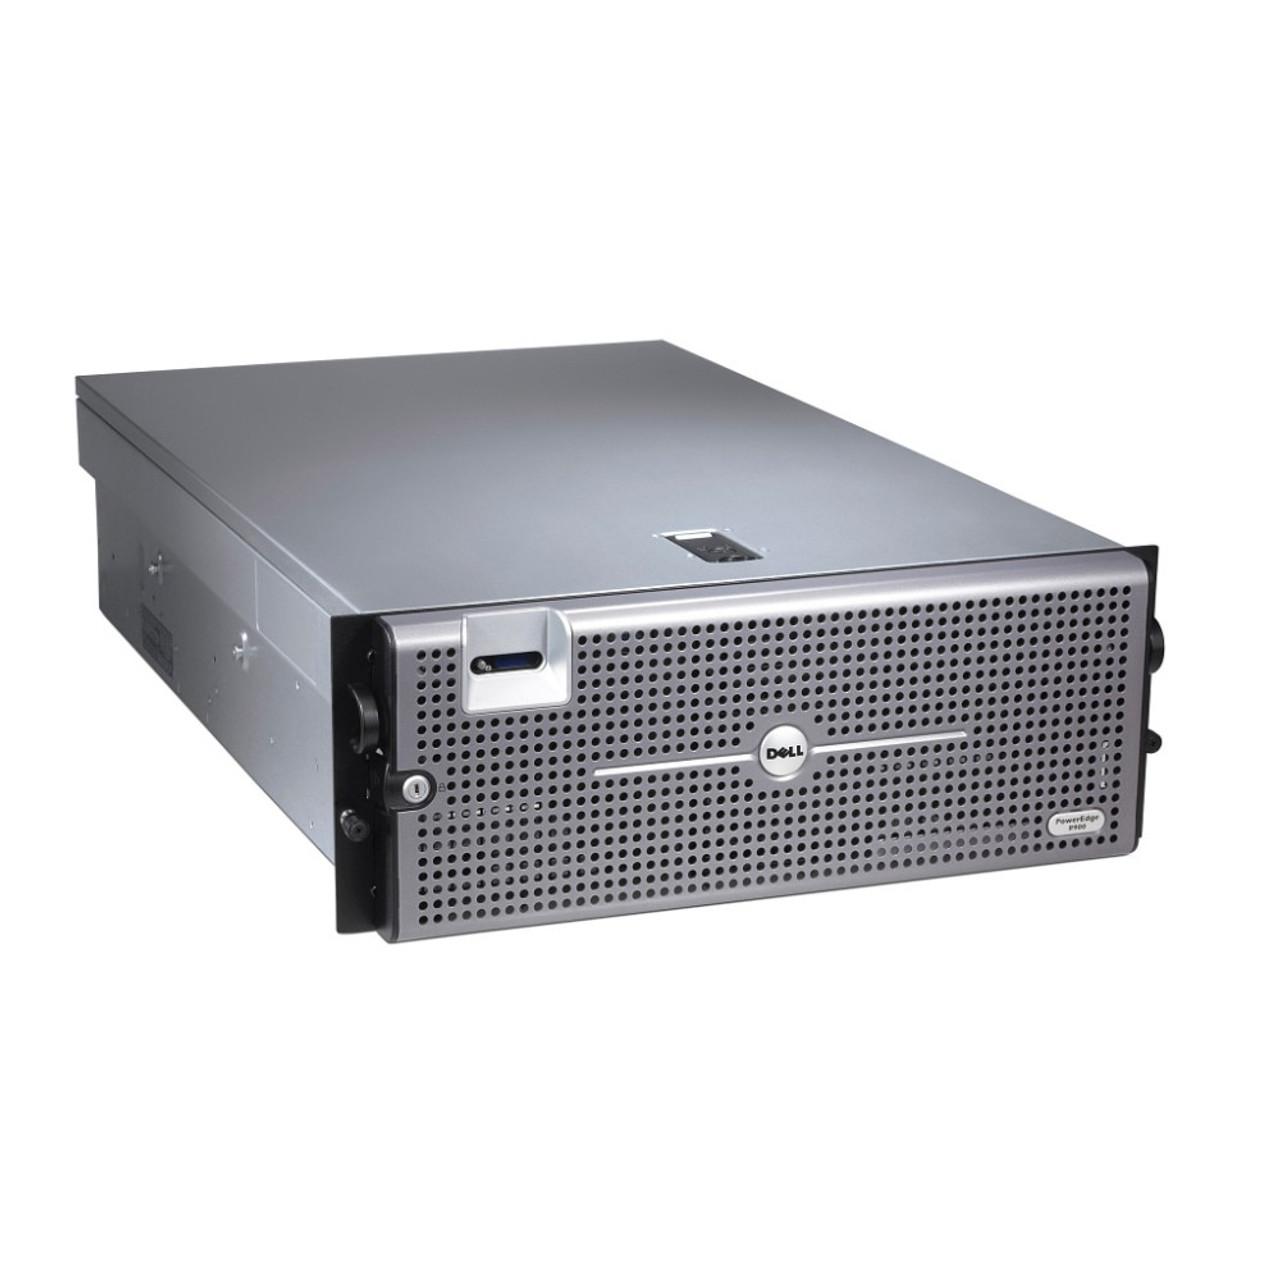 Dell Poweredge 2950 III 2x Xeon E5420 2.5ghz Quad Core 16gb 6x 73gb 15k Raid